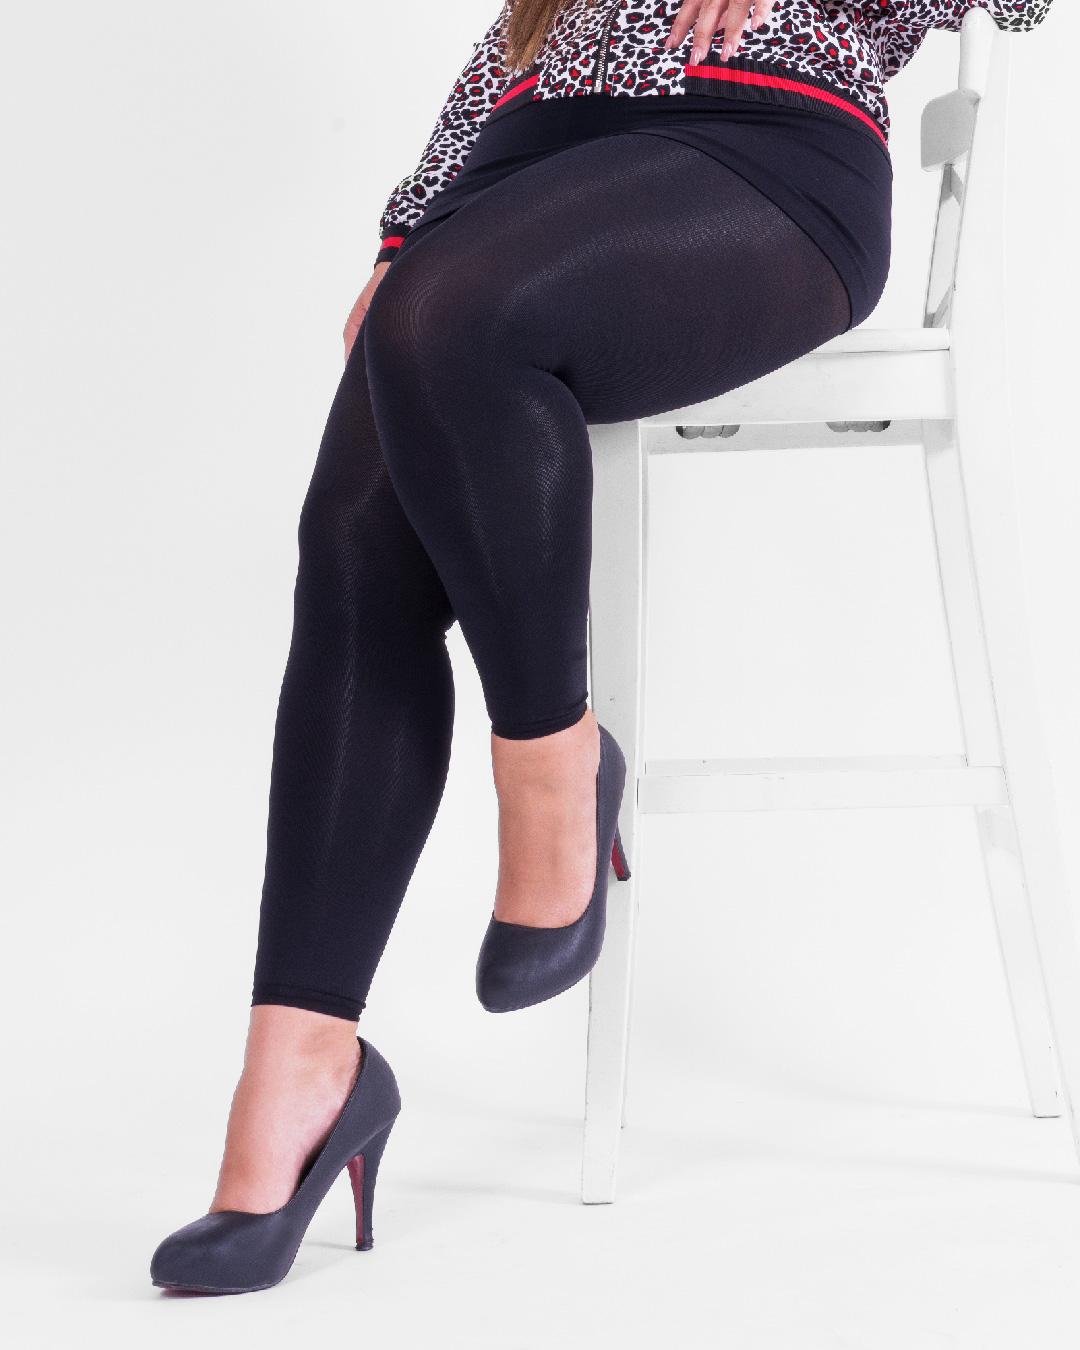 personalsize-exclusive-leggings-exclusive-prd_003.jpg